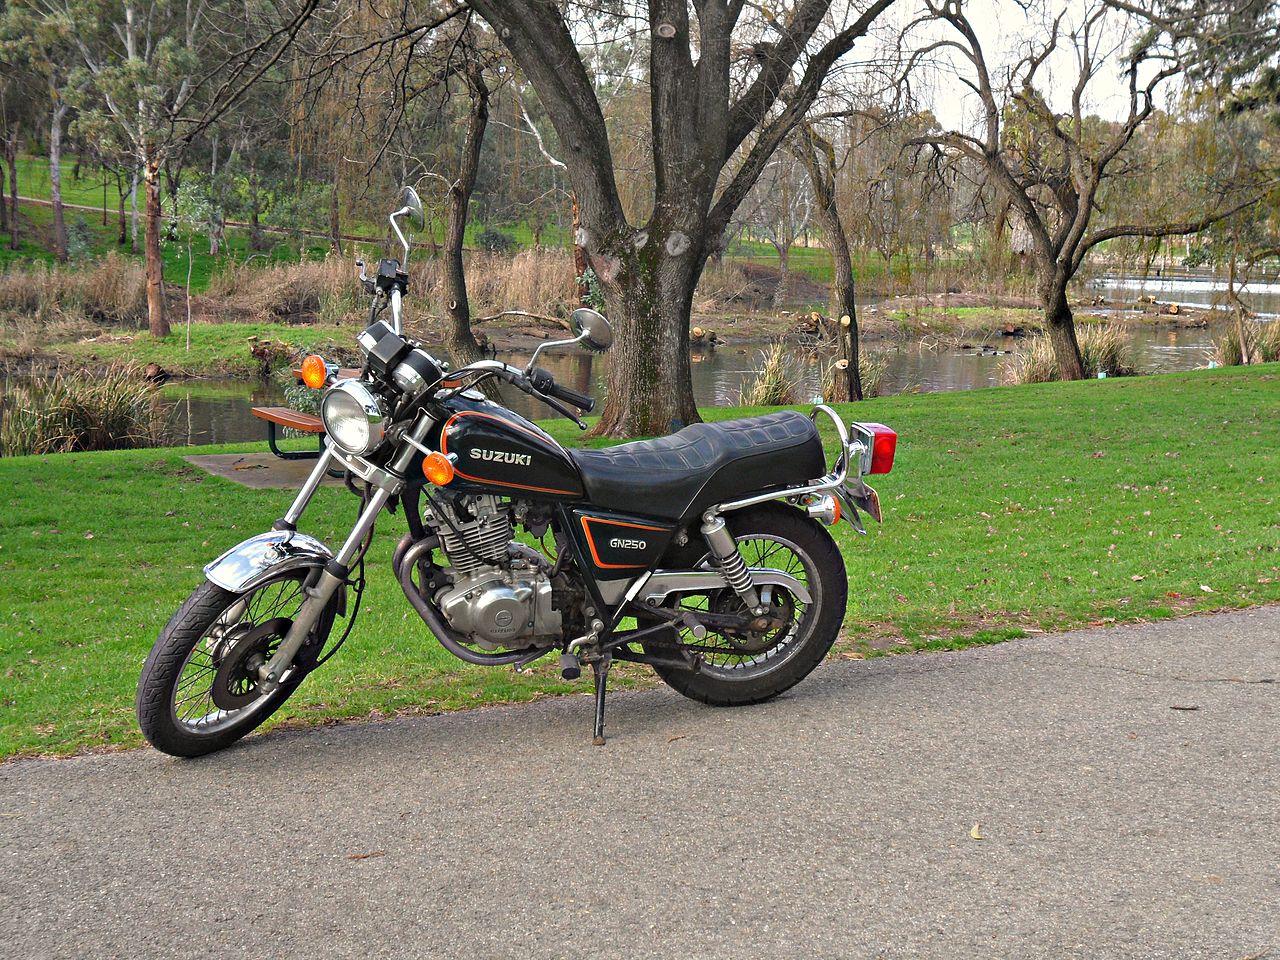 https://upload.wikimedia.org/wikipedia/commons/thumb/5/5f/Suzuki_GN250_Motorcycle.JPG/1280px-Suzuki_GN250_Motorcycle.JPG